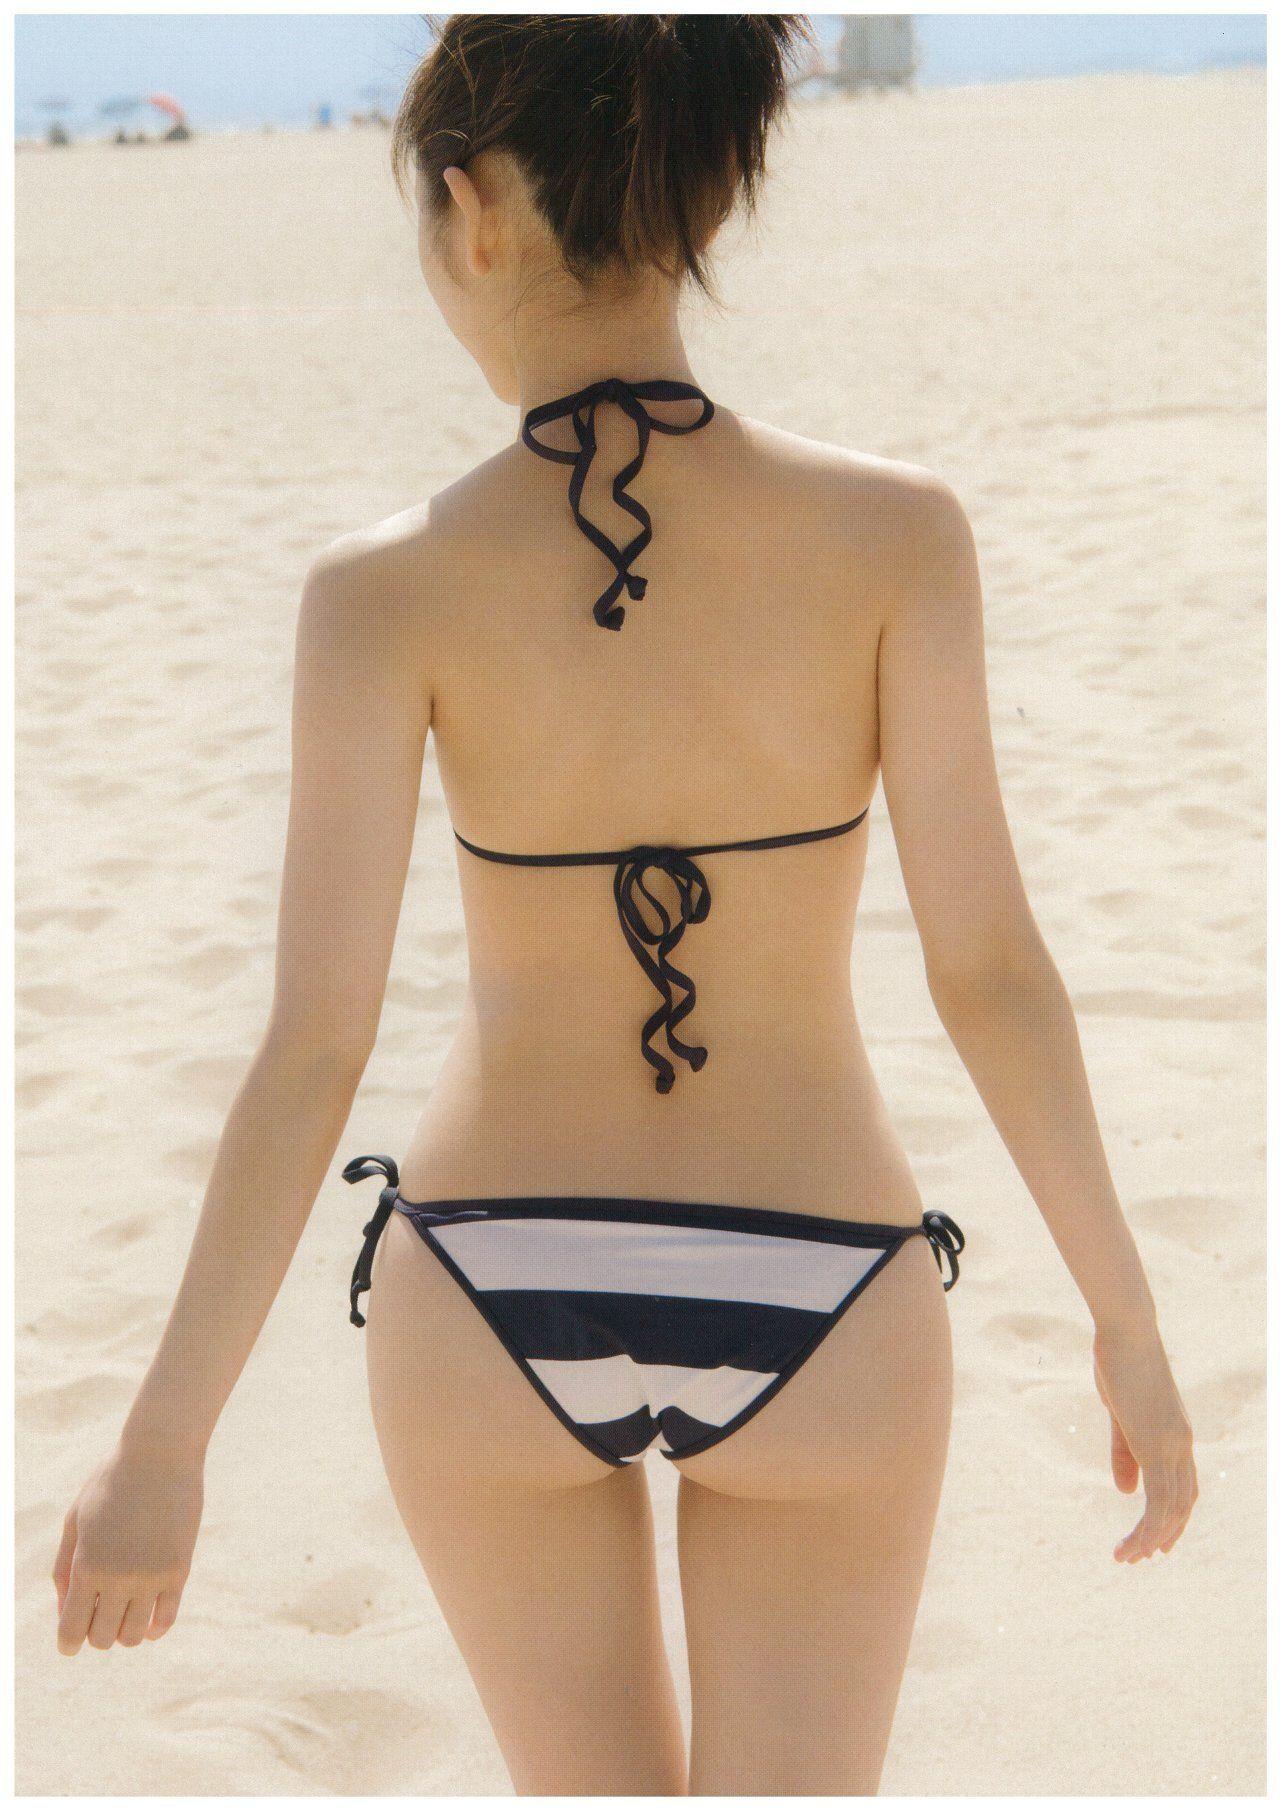 New day. Japanese bikini culture agree